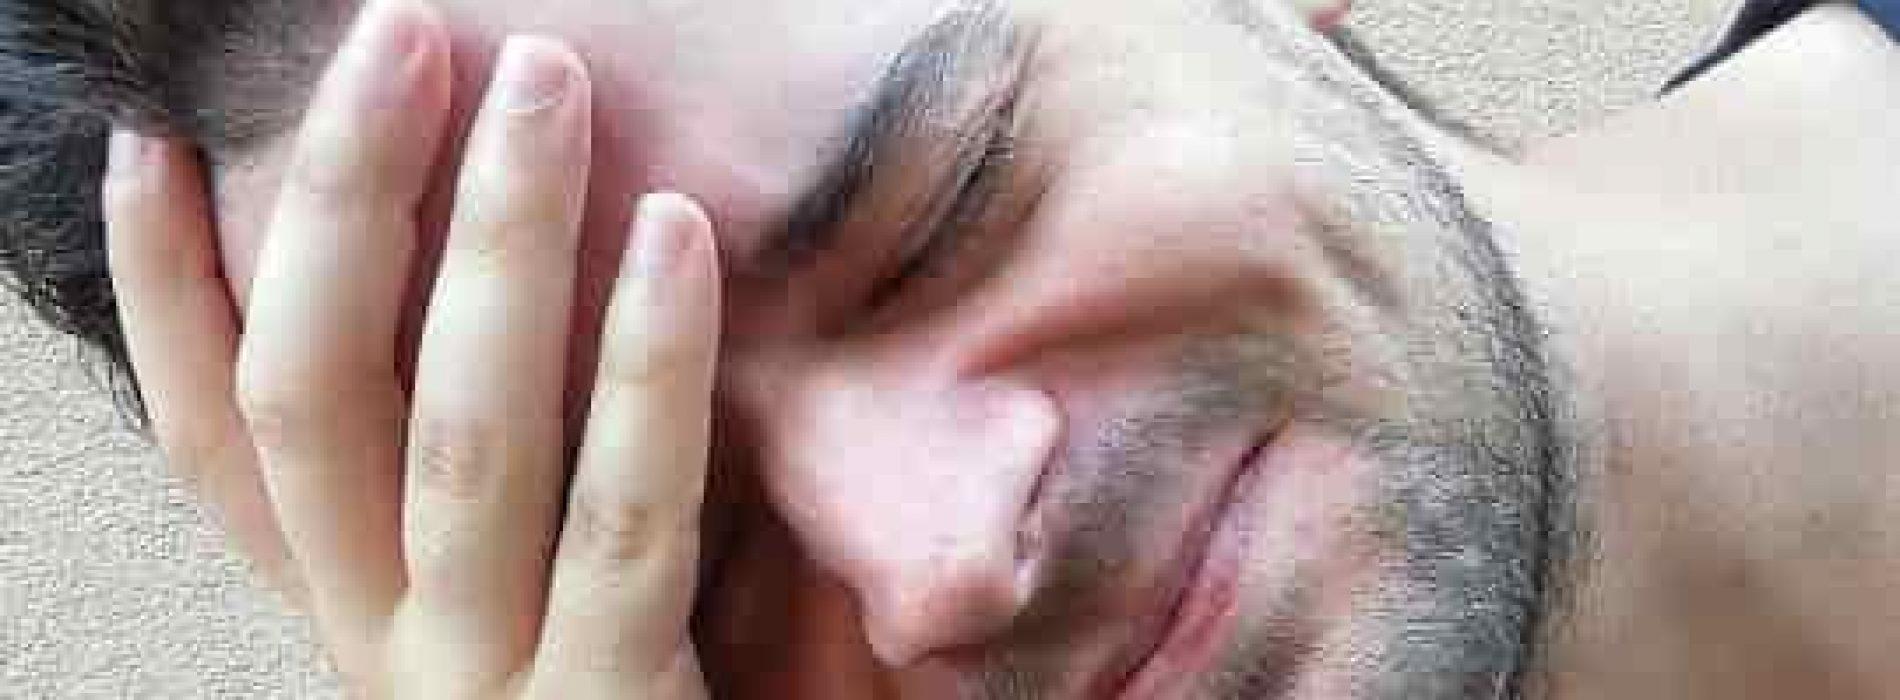 Migrene symptomer, diagnose og ulike faser